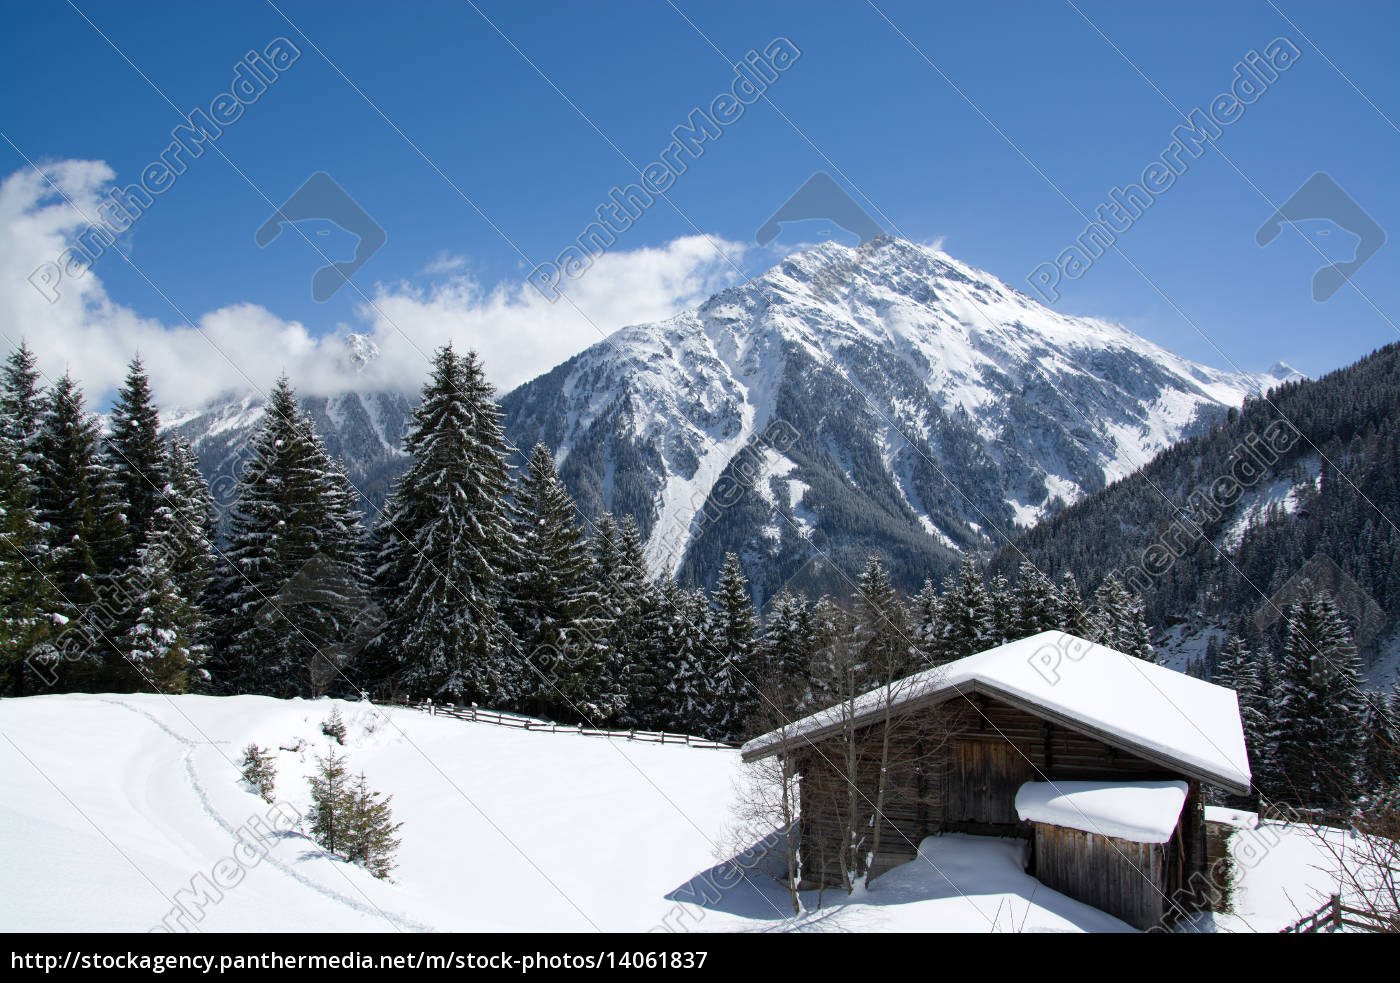 pinzgau, austria - 14061837